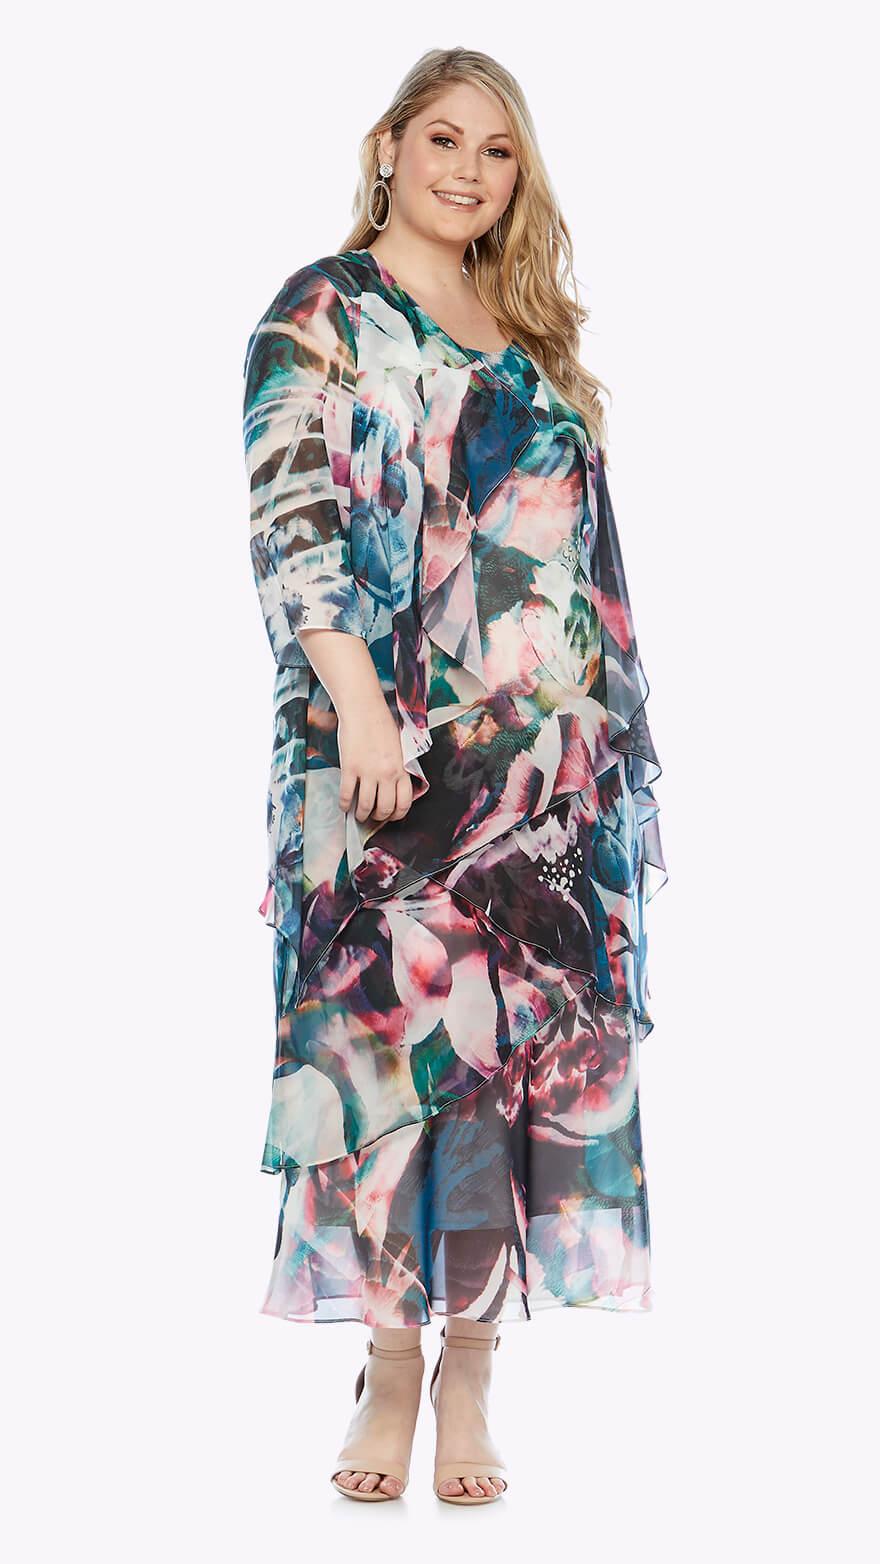 LJ0348 Layered full-length dress with matching waterfall chiffon jacket in graphic print